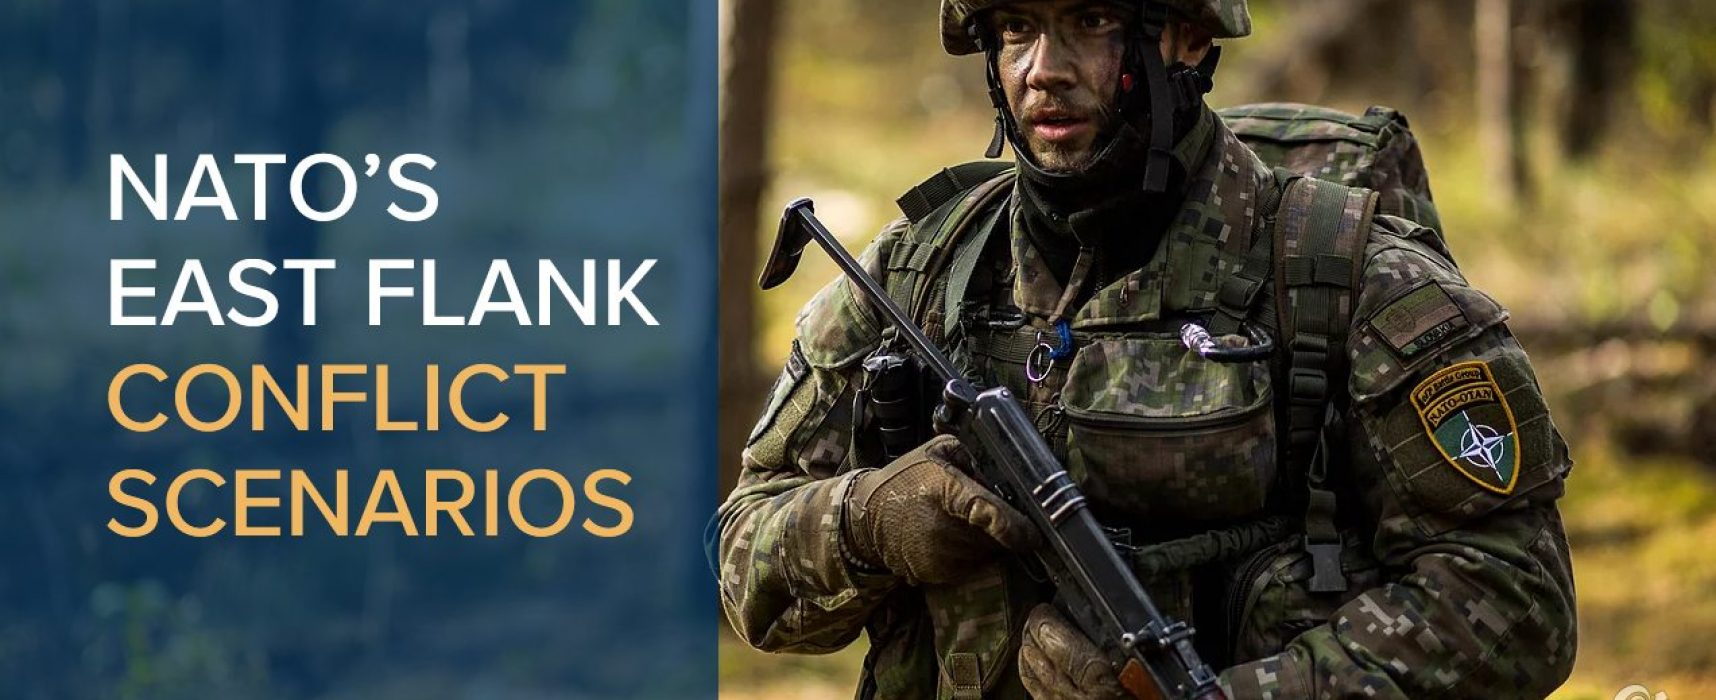 NATO's East flank: conflict scenarios